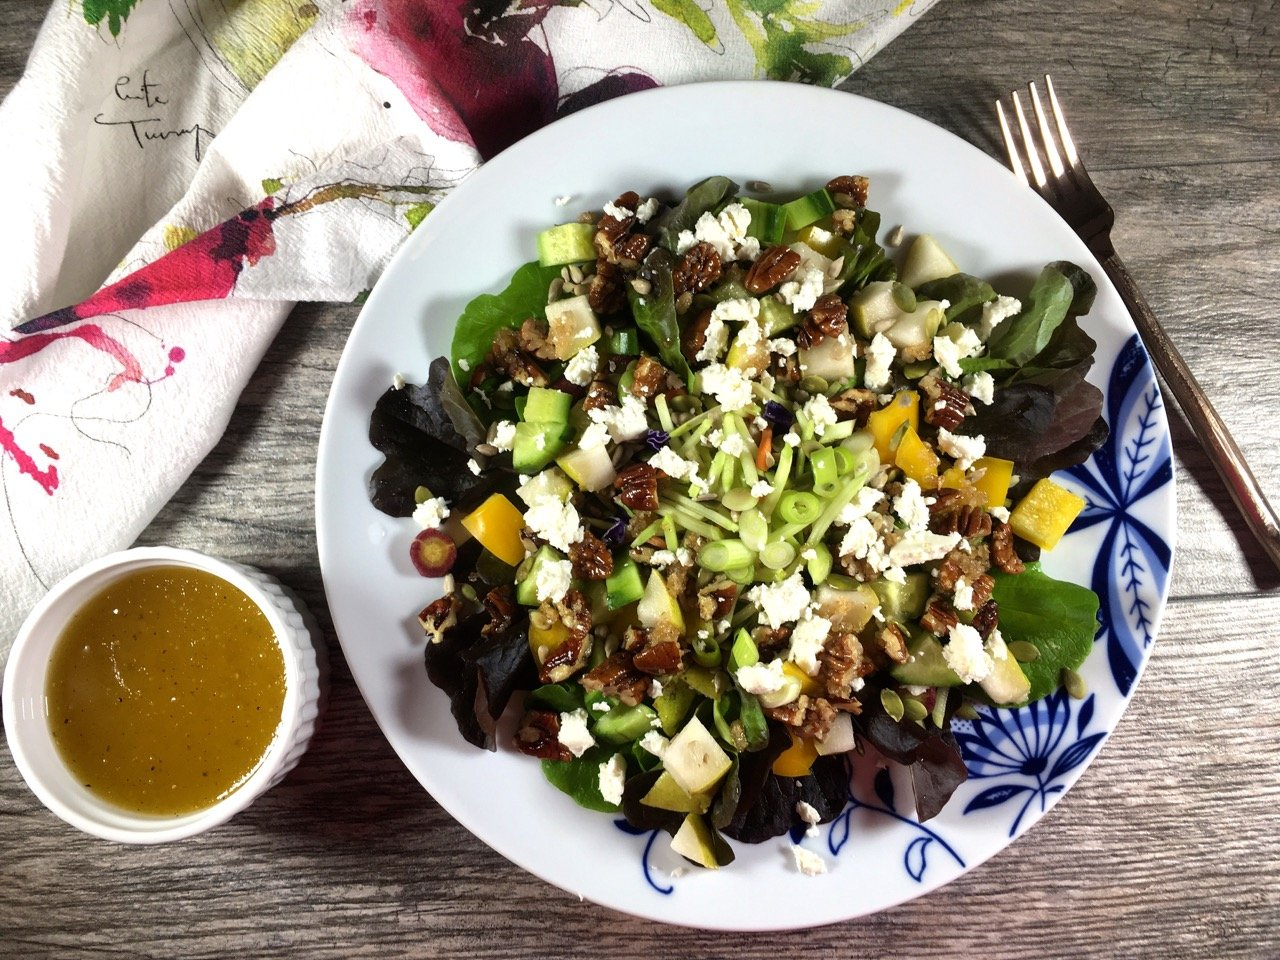 gluten-free seasonal salad recipe with apple cider honey vinaigrette